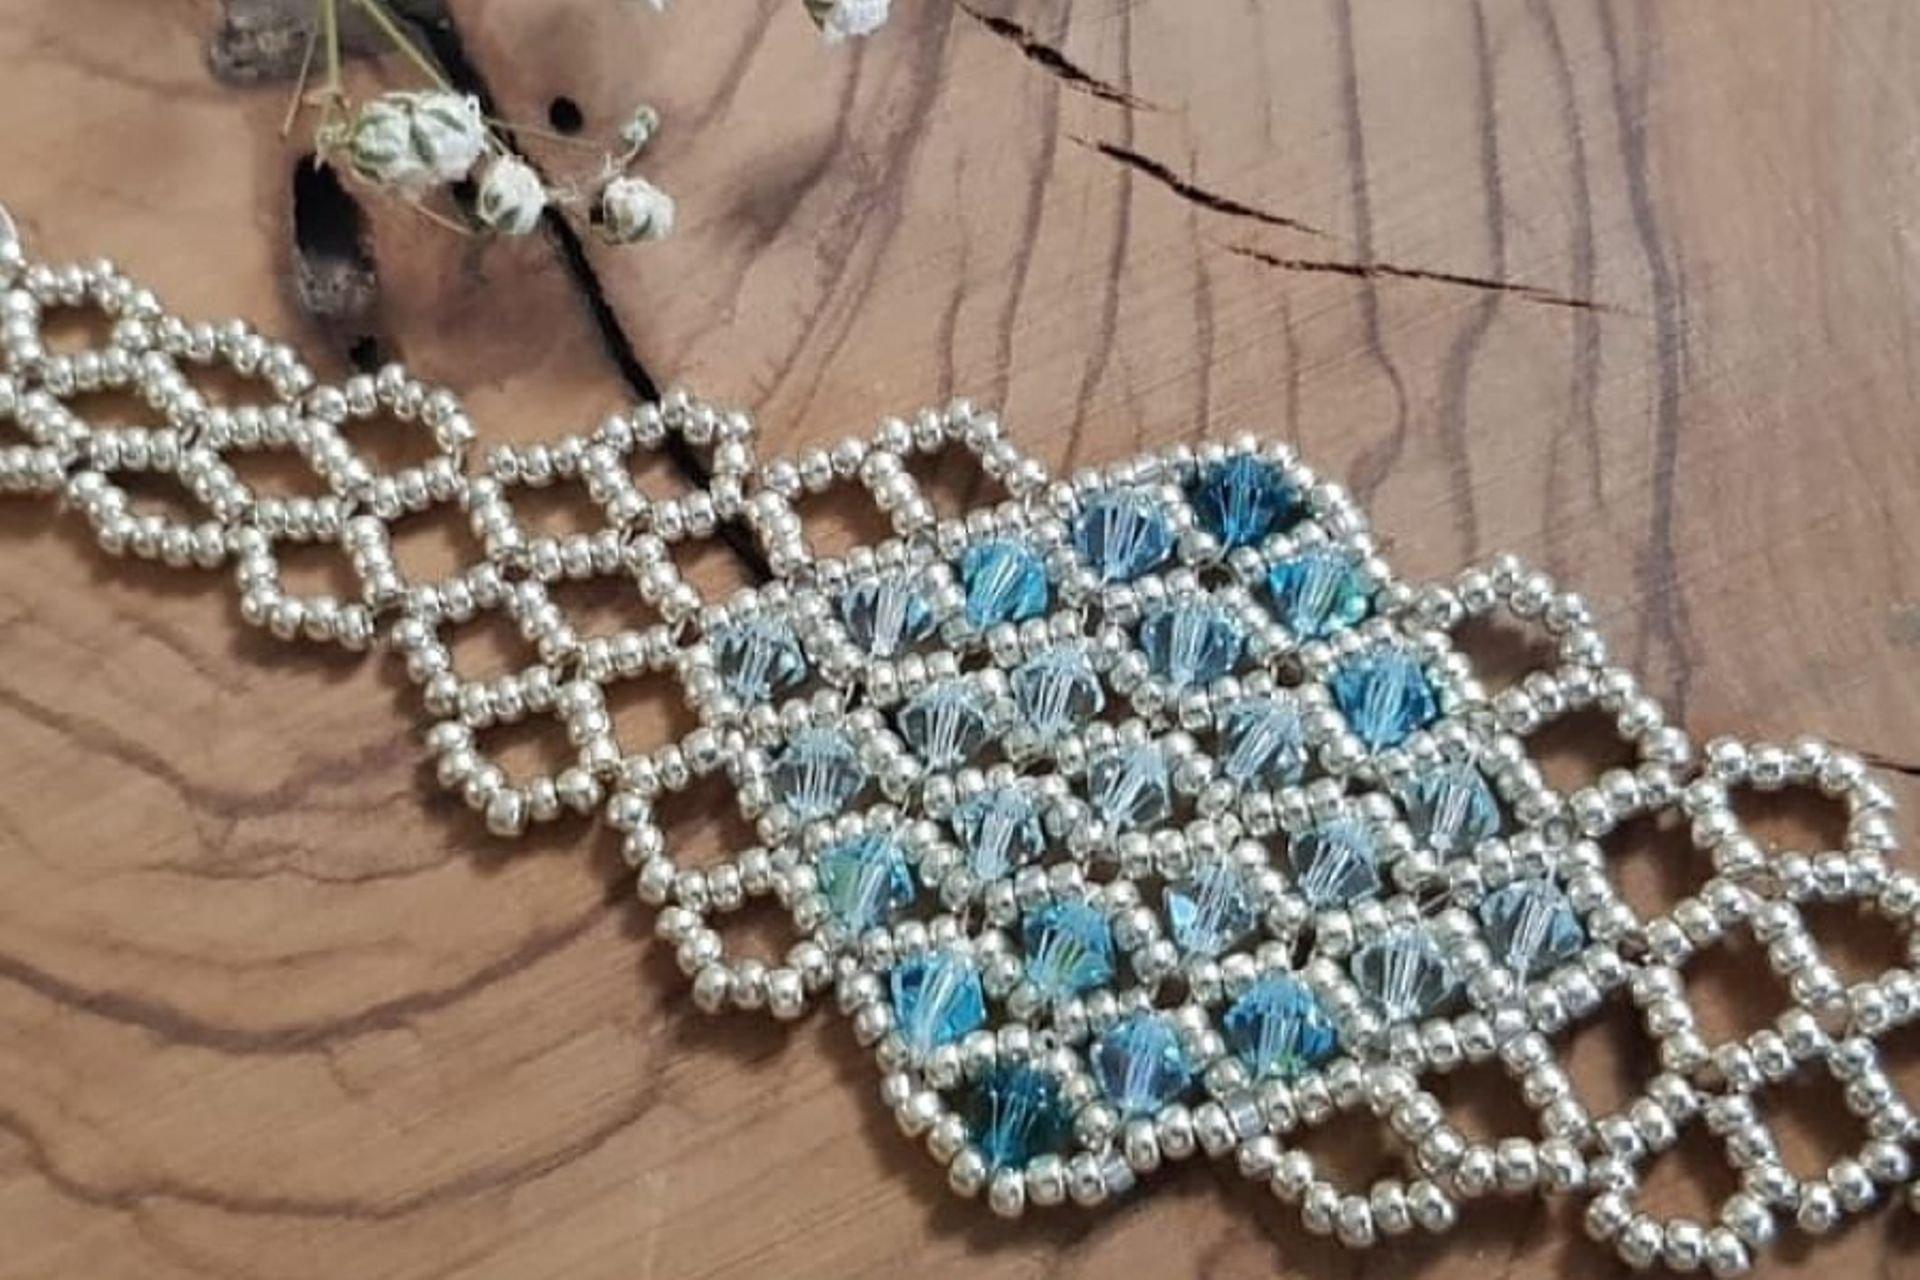 30 lantana beads jewelry designer תְמוּנָה